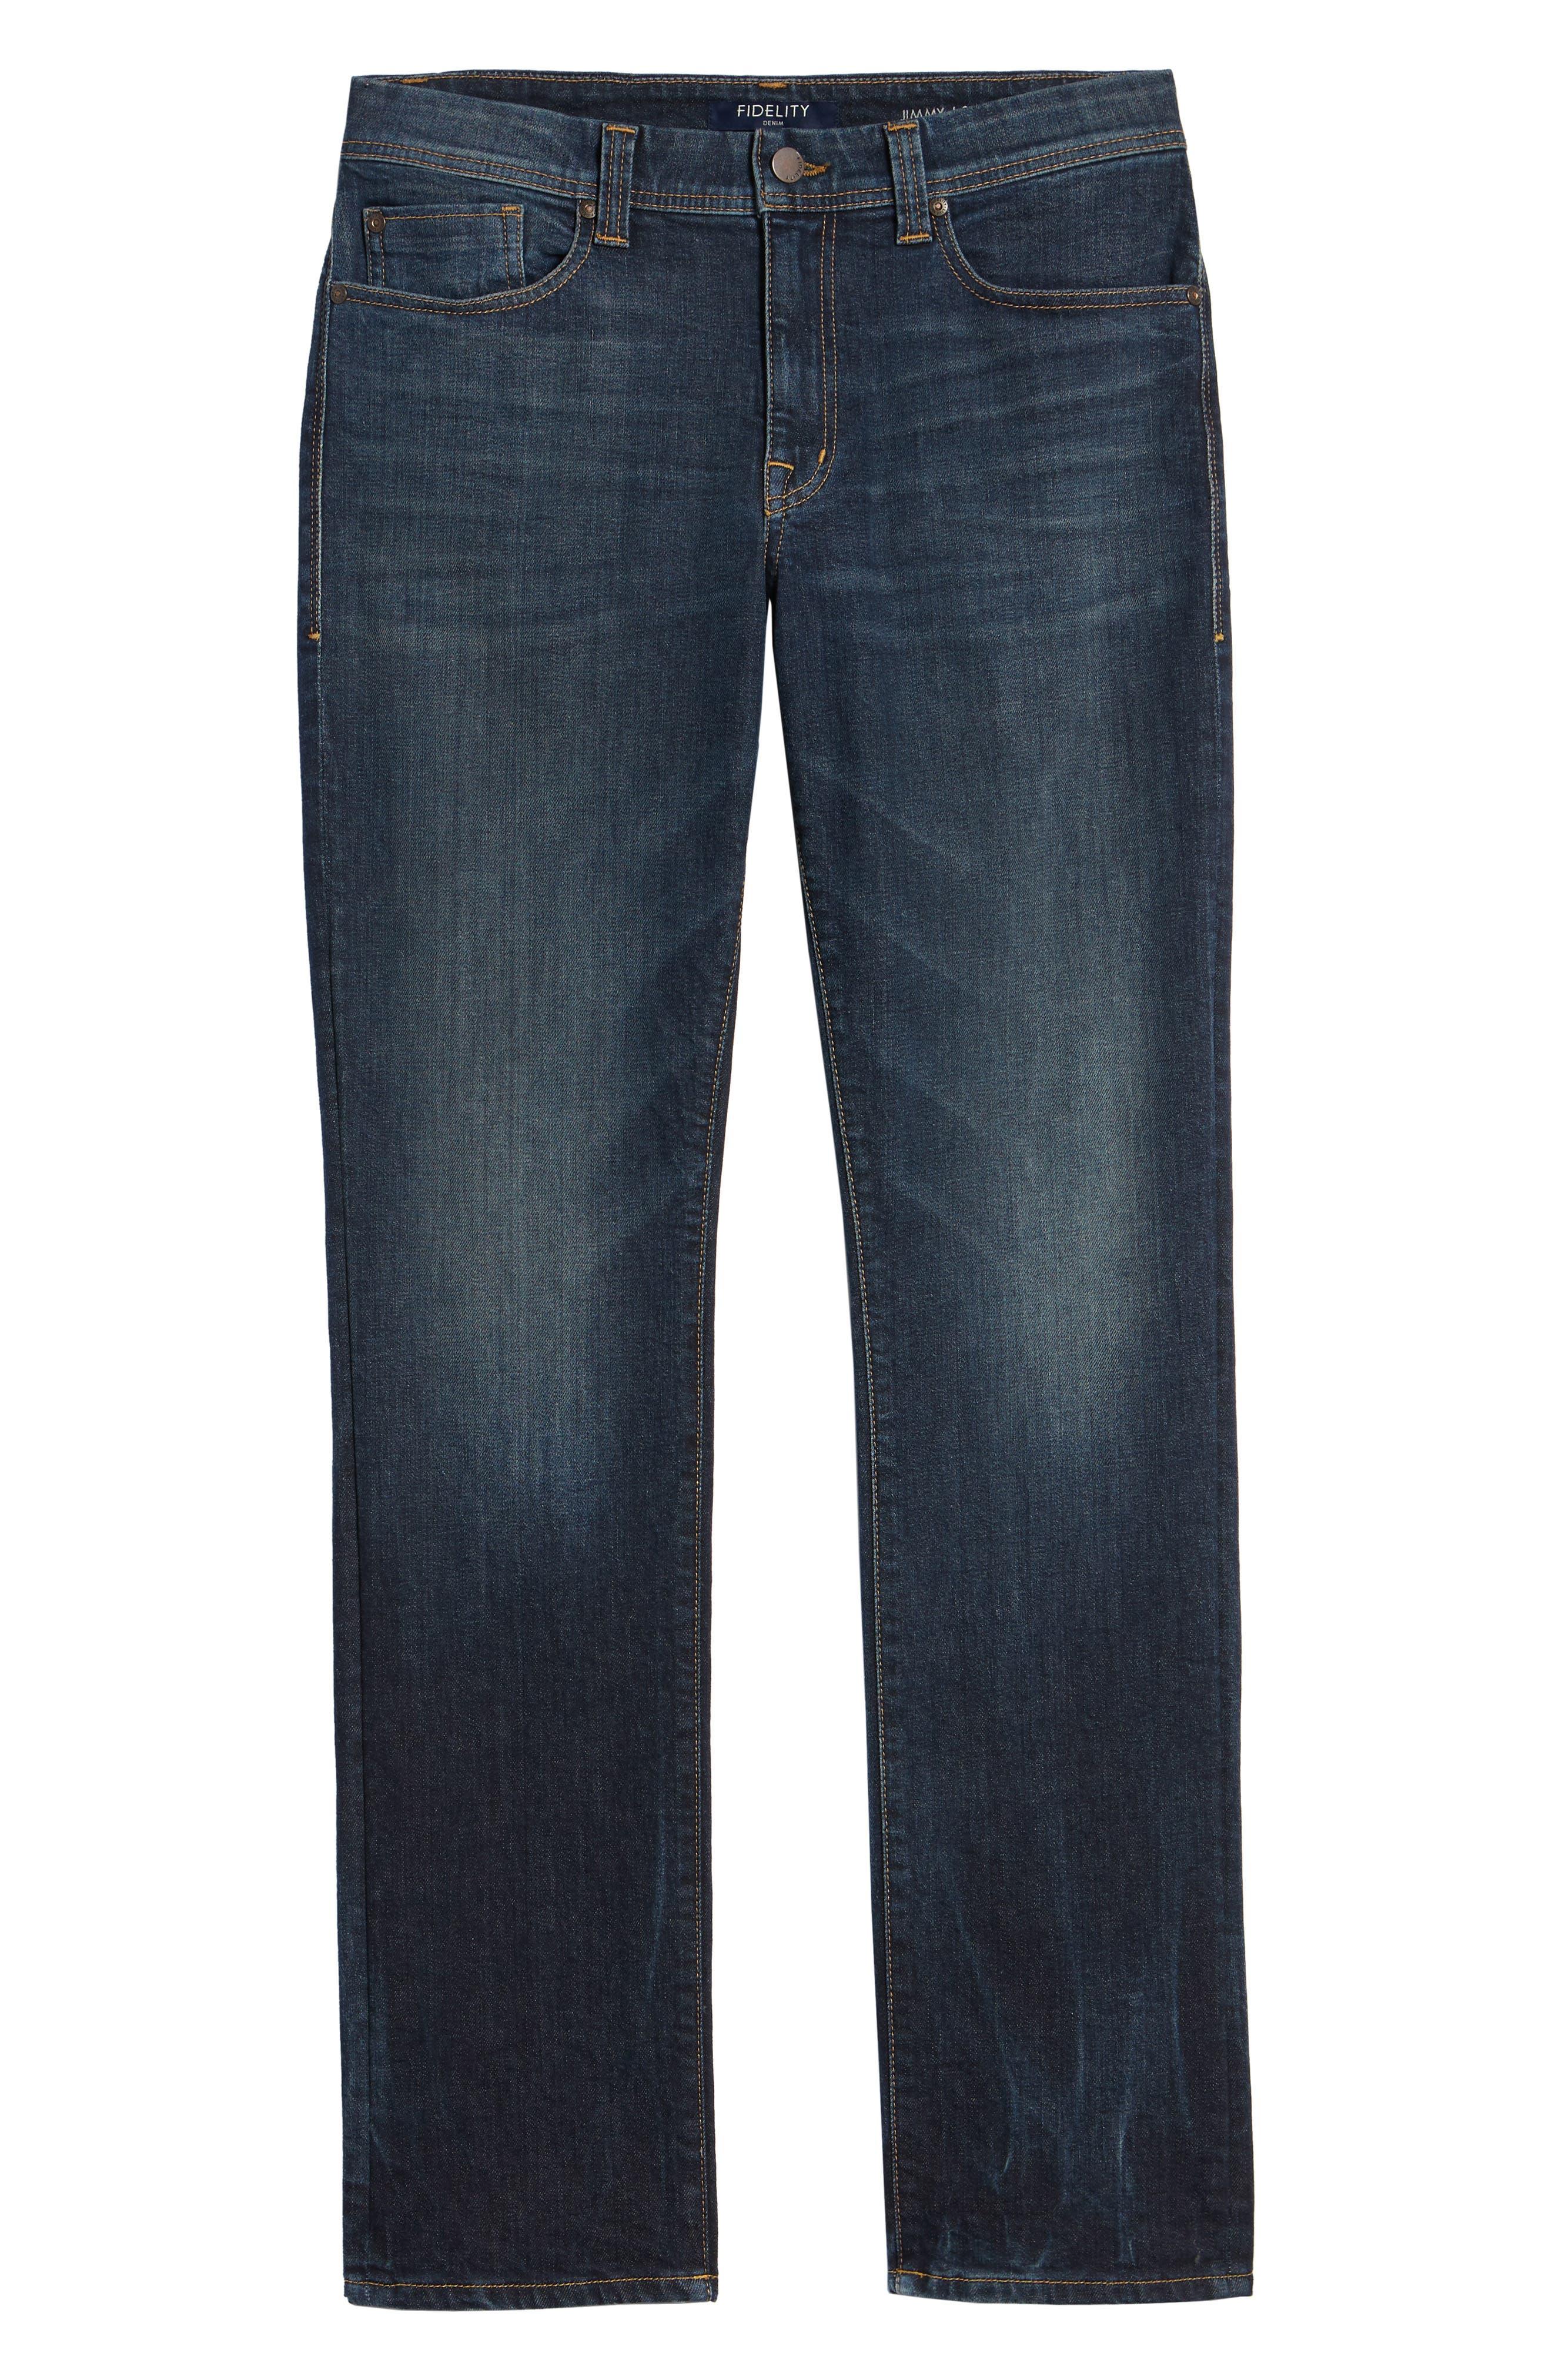 Jimmy Slim Straight Leg Jeans,                             Alternate thumbnail 6, color,                             NIAGARA